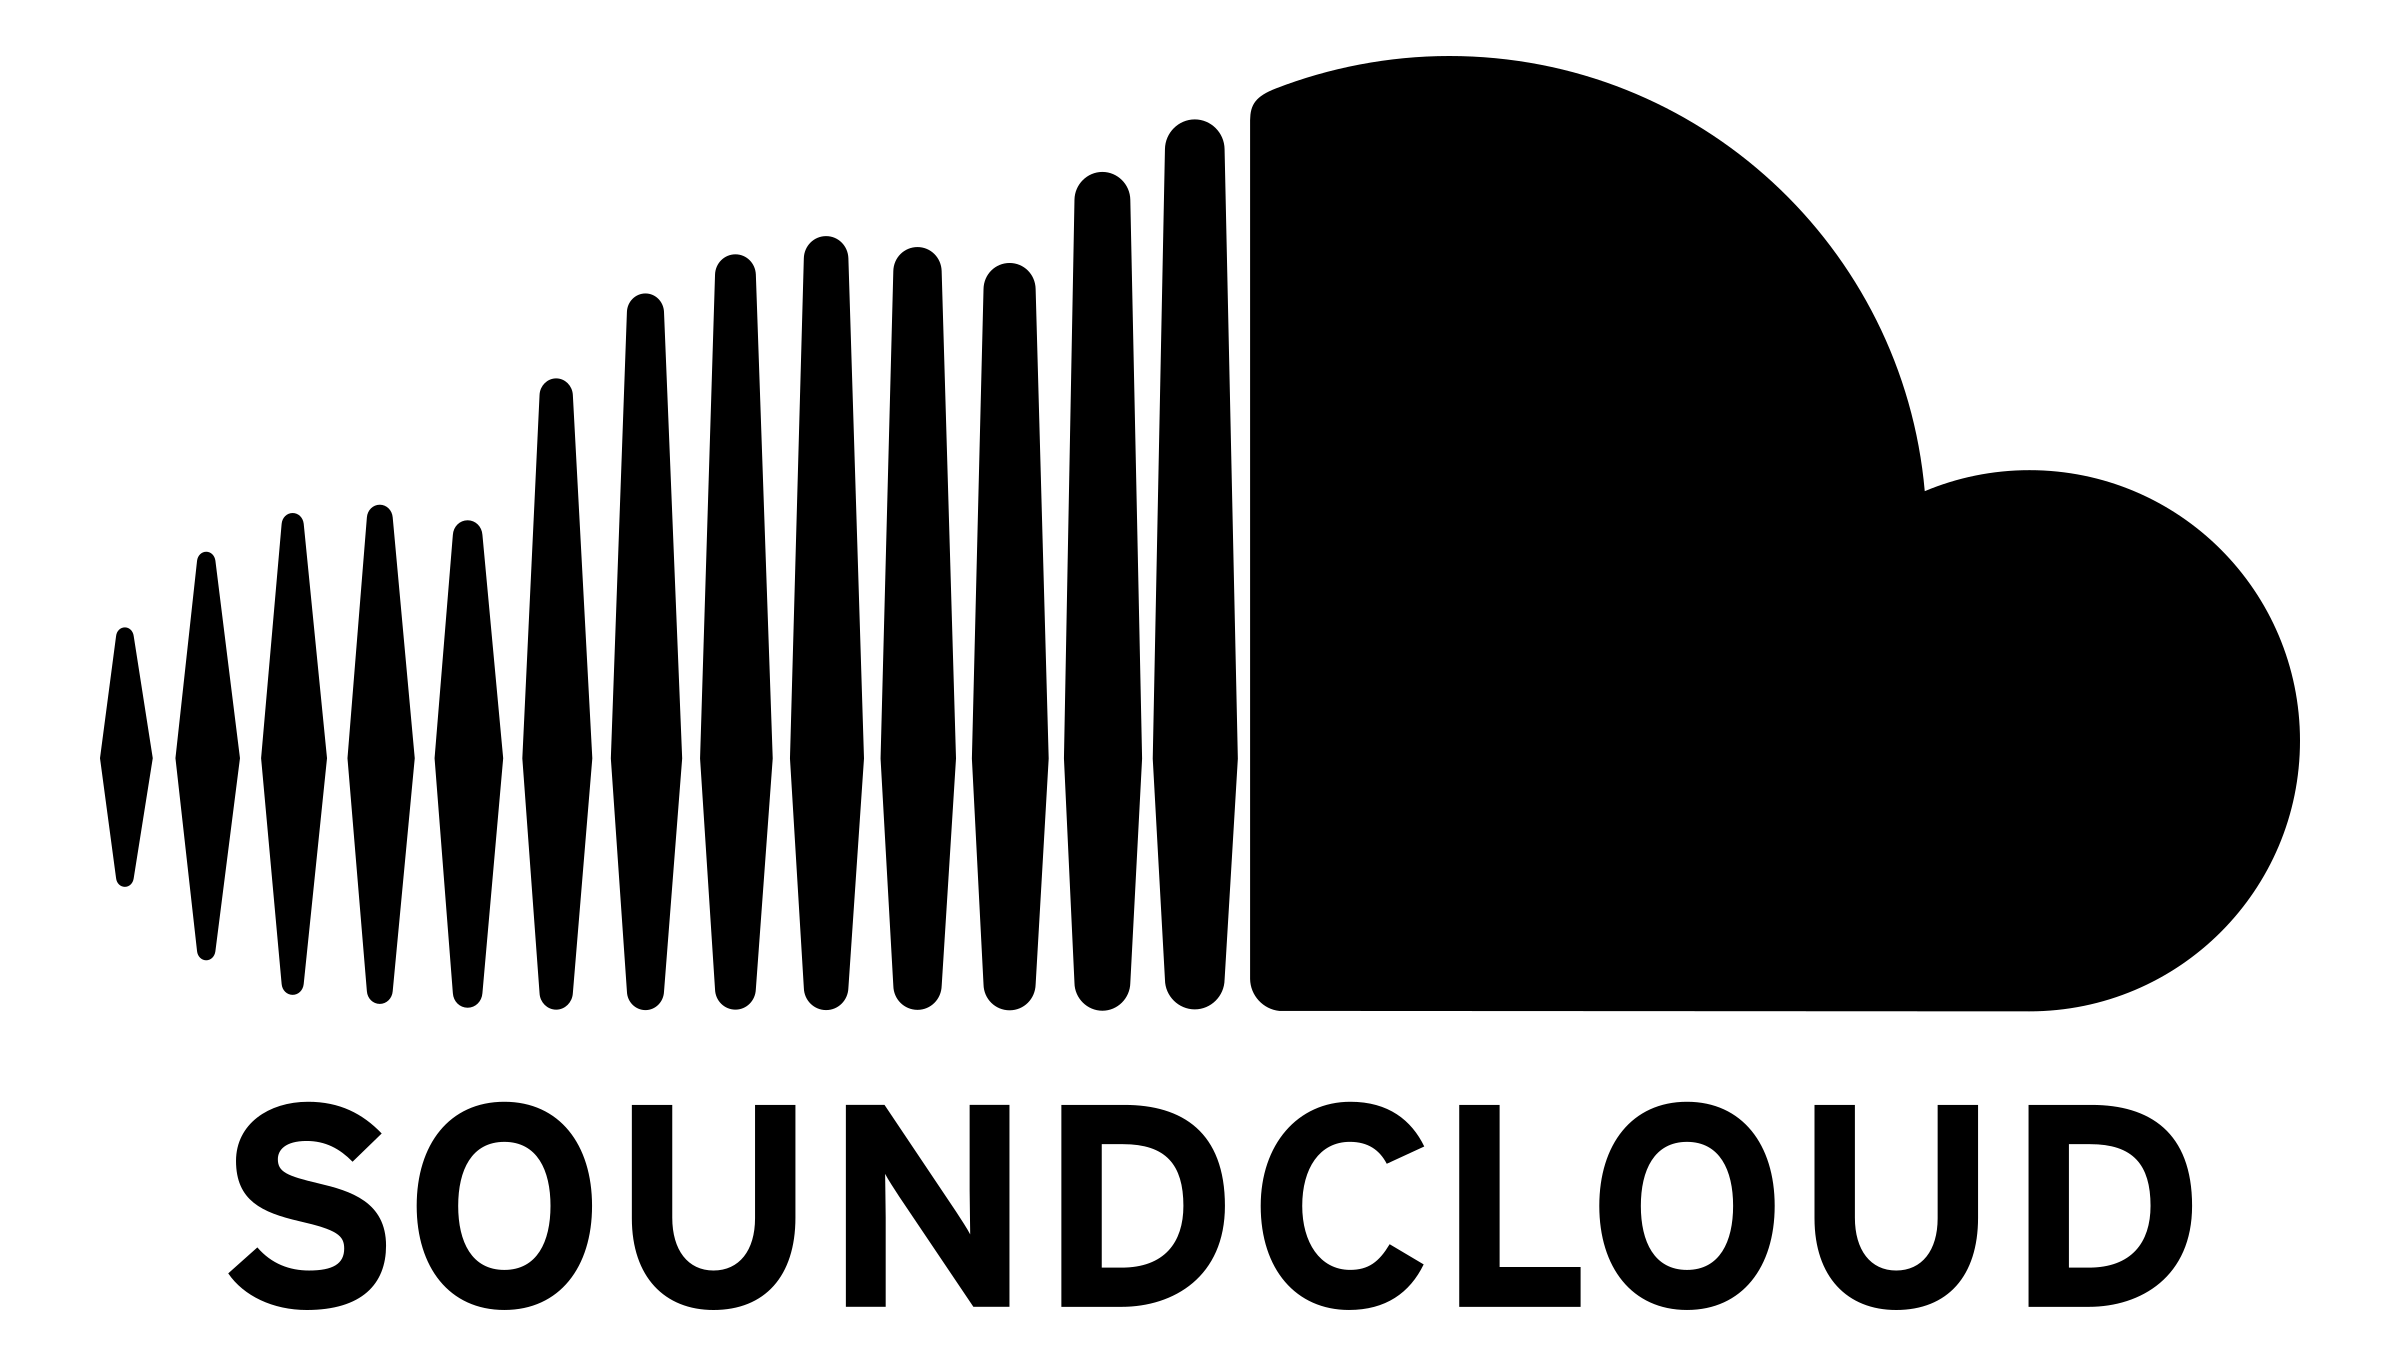 soundcloud-logo-png-4.png